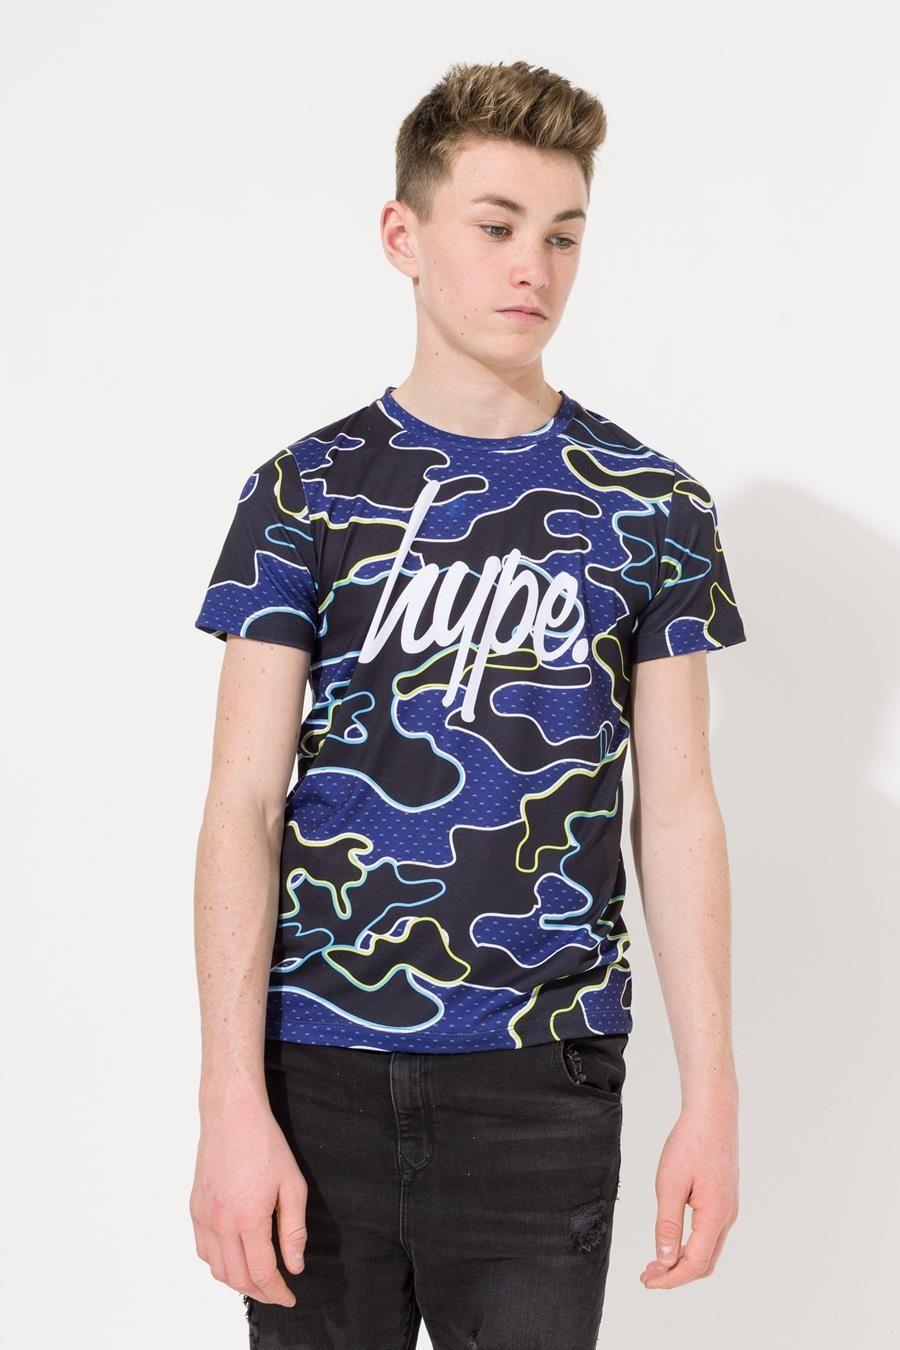 Hype Blue Neon Camo Kids Sub T-Shirt